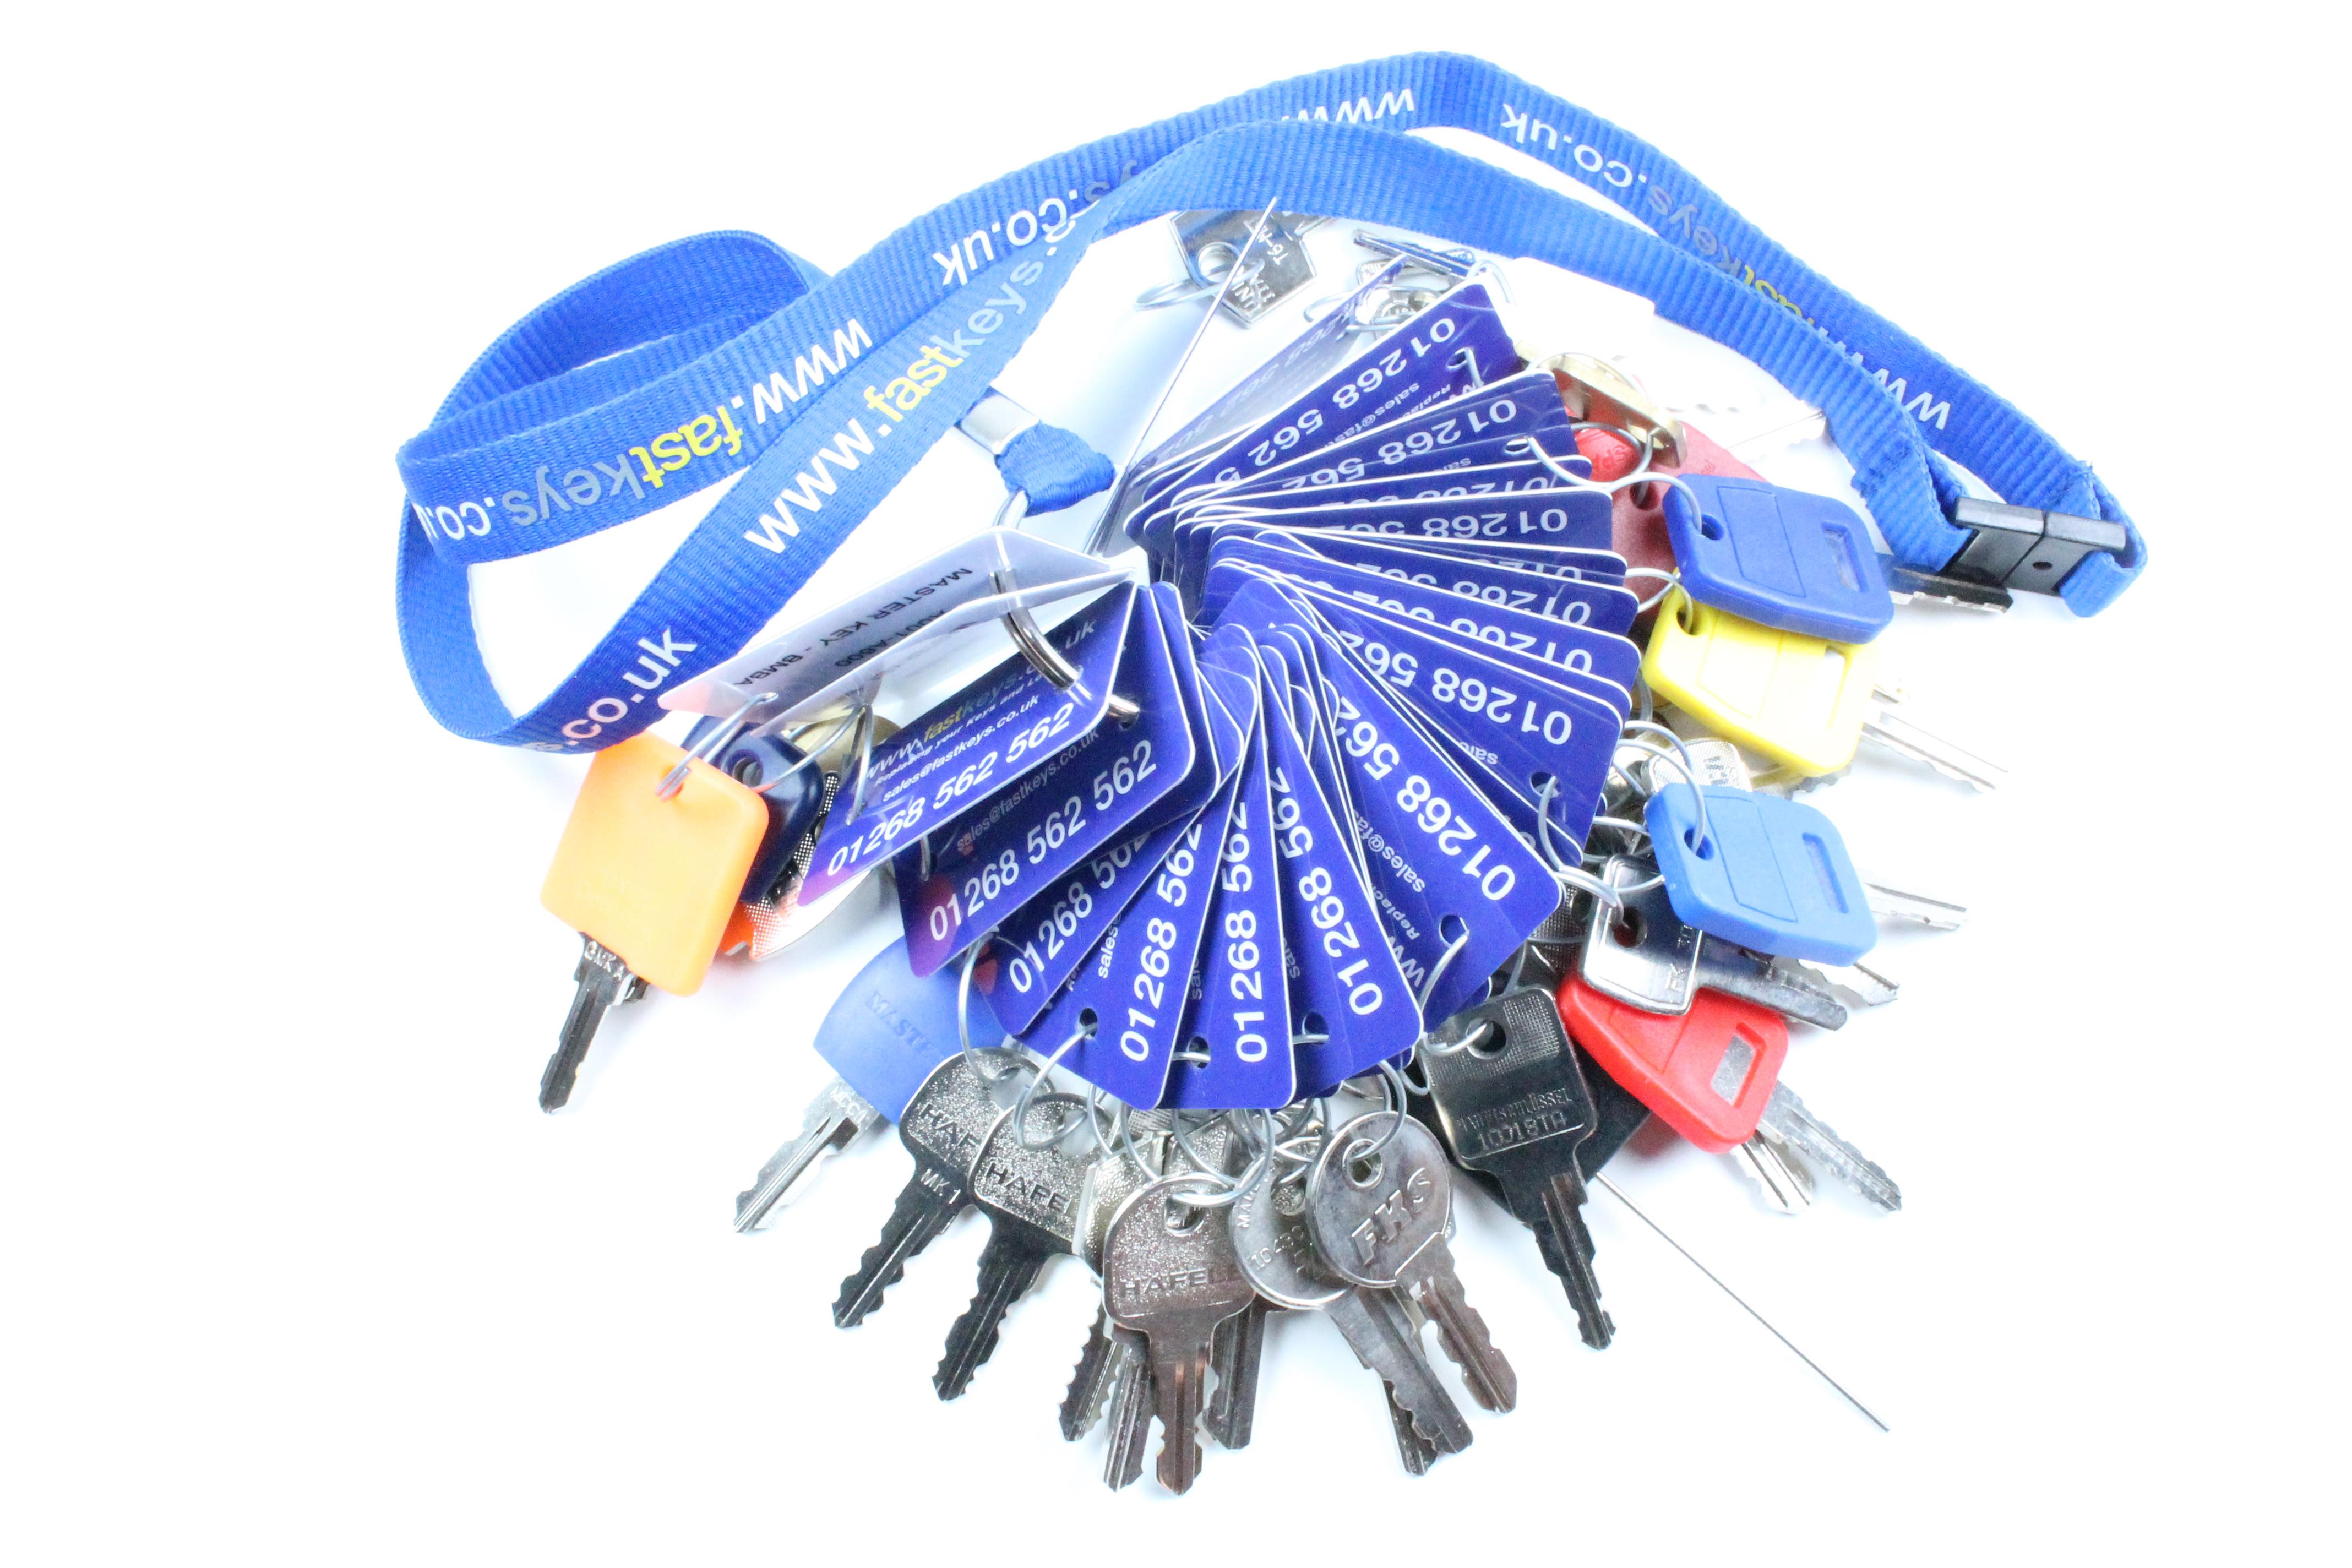 Master key sets